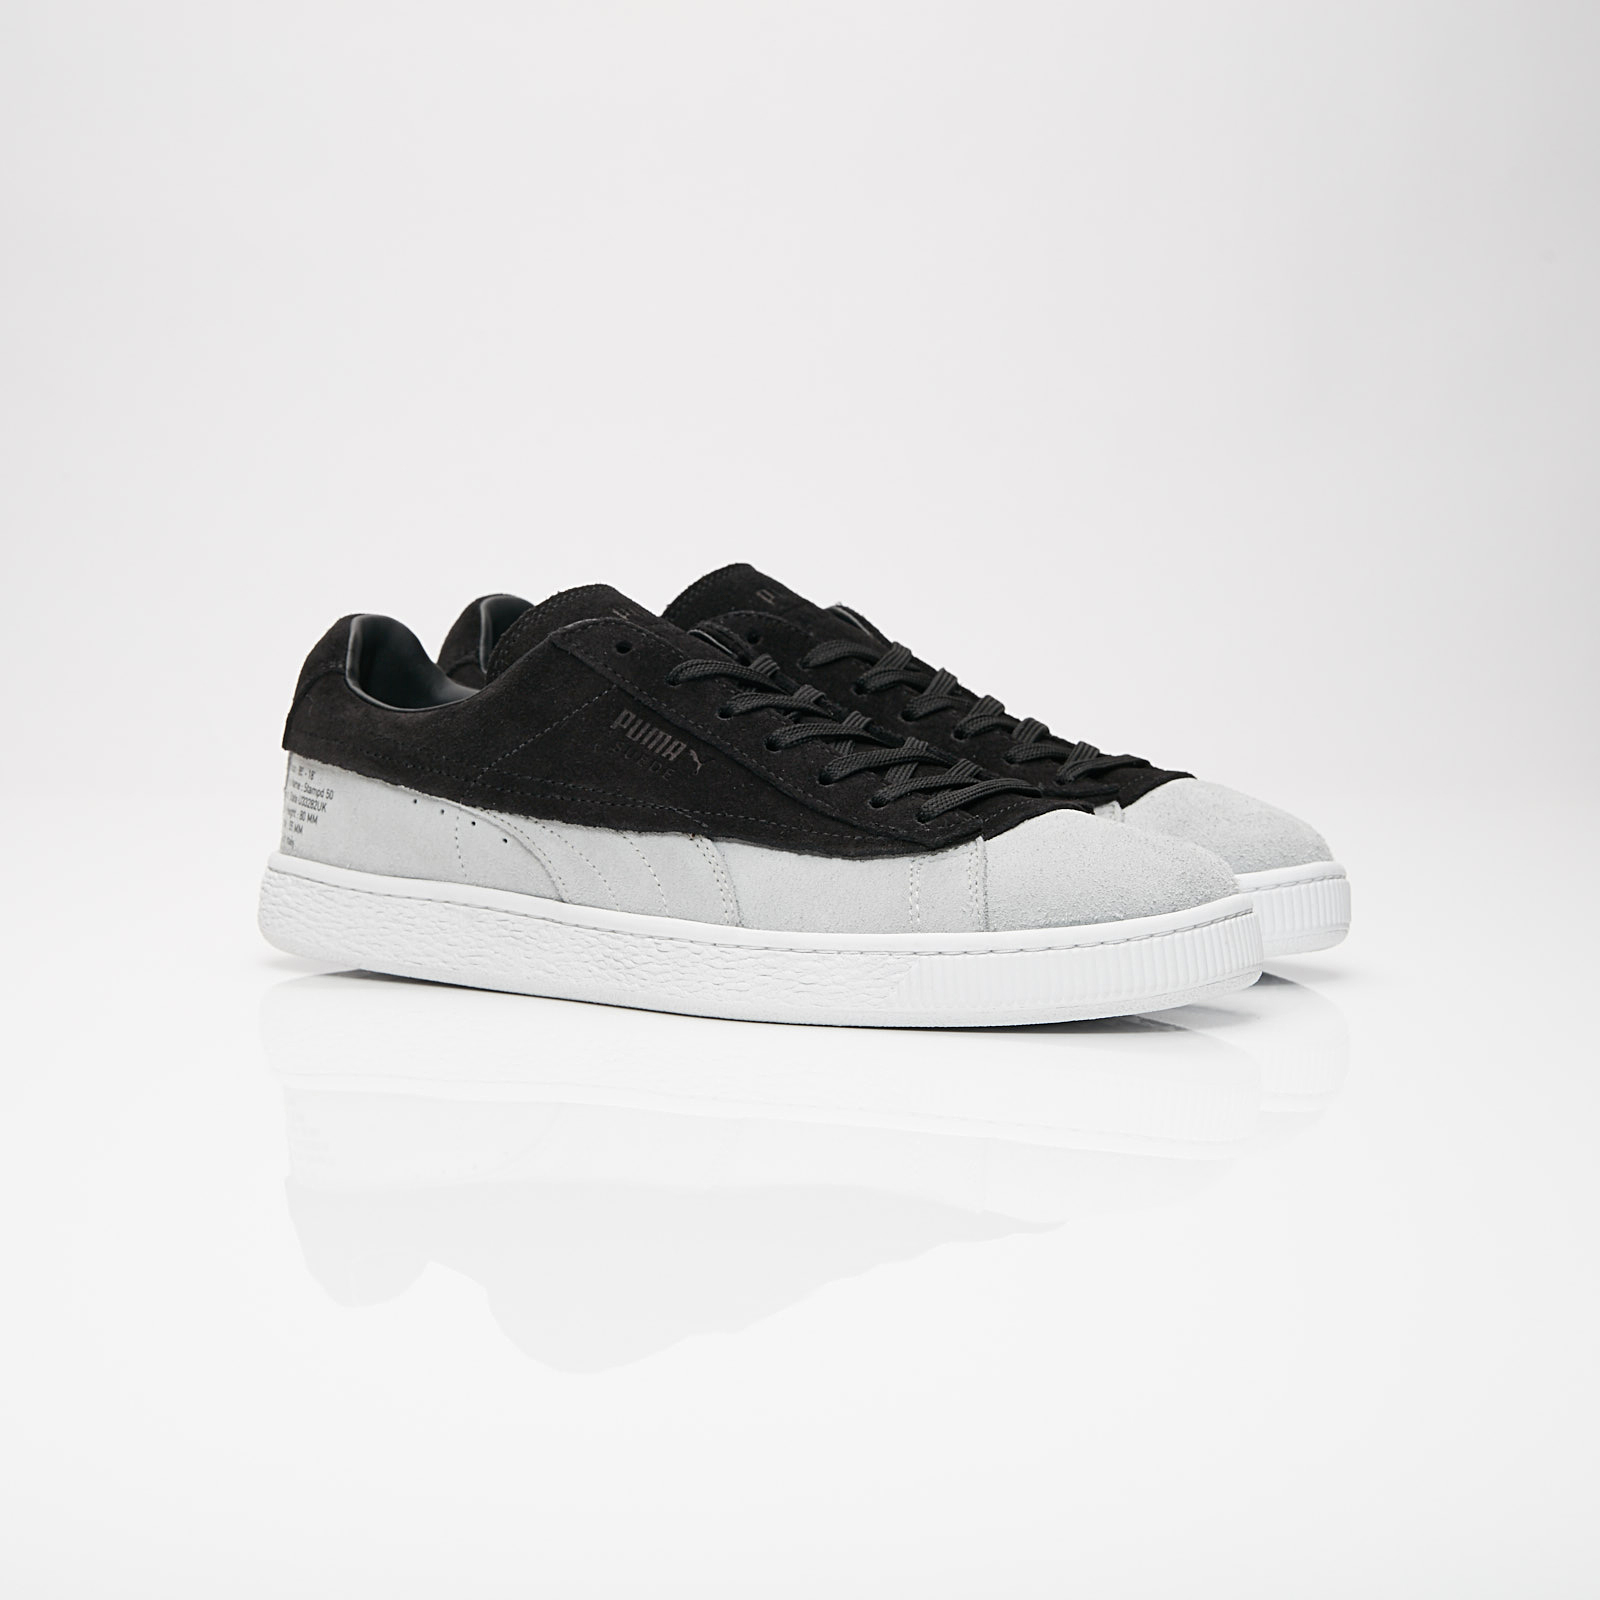 db0d834dc7b Puma Suede Classic x Stampd - 366327-01 - Sneakersnstuff